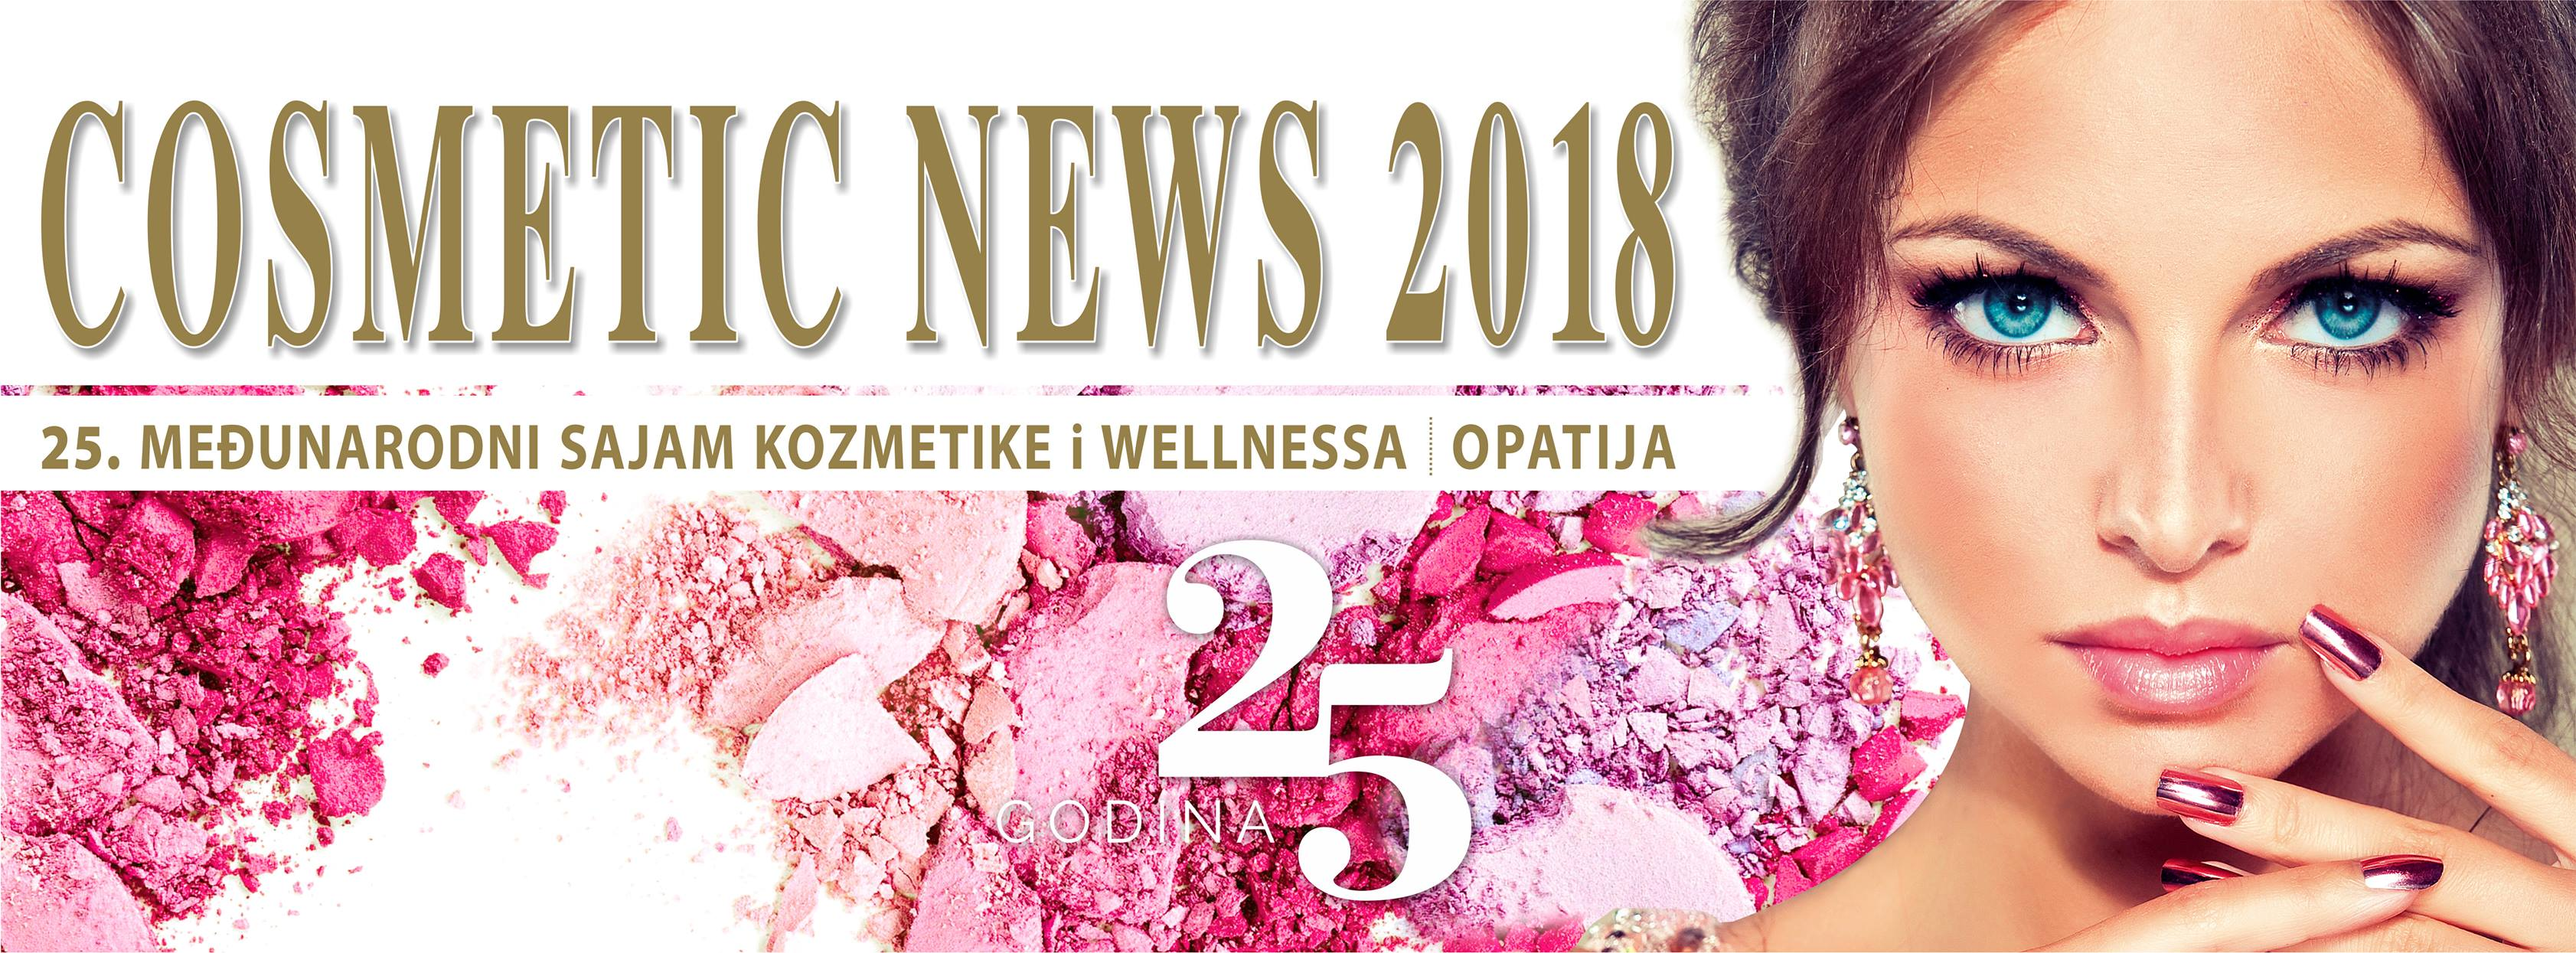 1. OPATIJA - ``COSMETIC NEWS`` 24.- 25.2. 2018.